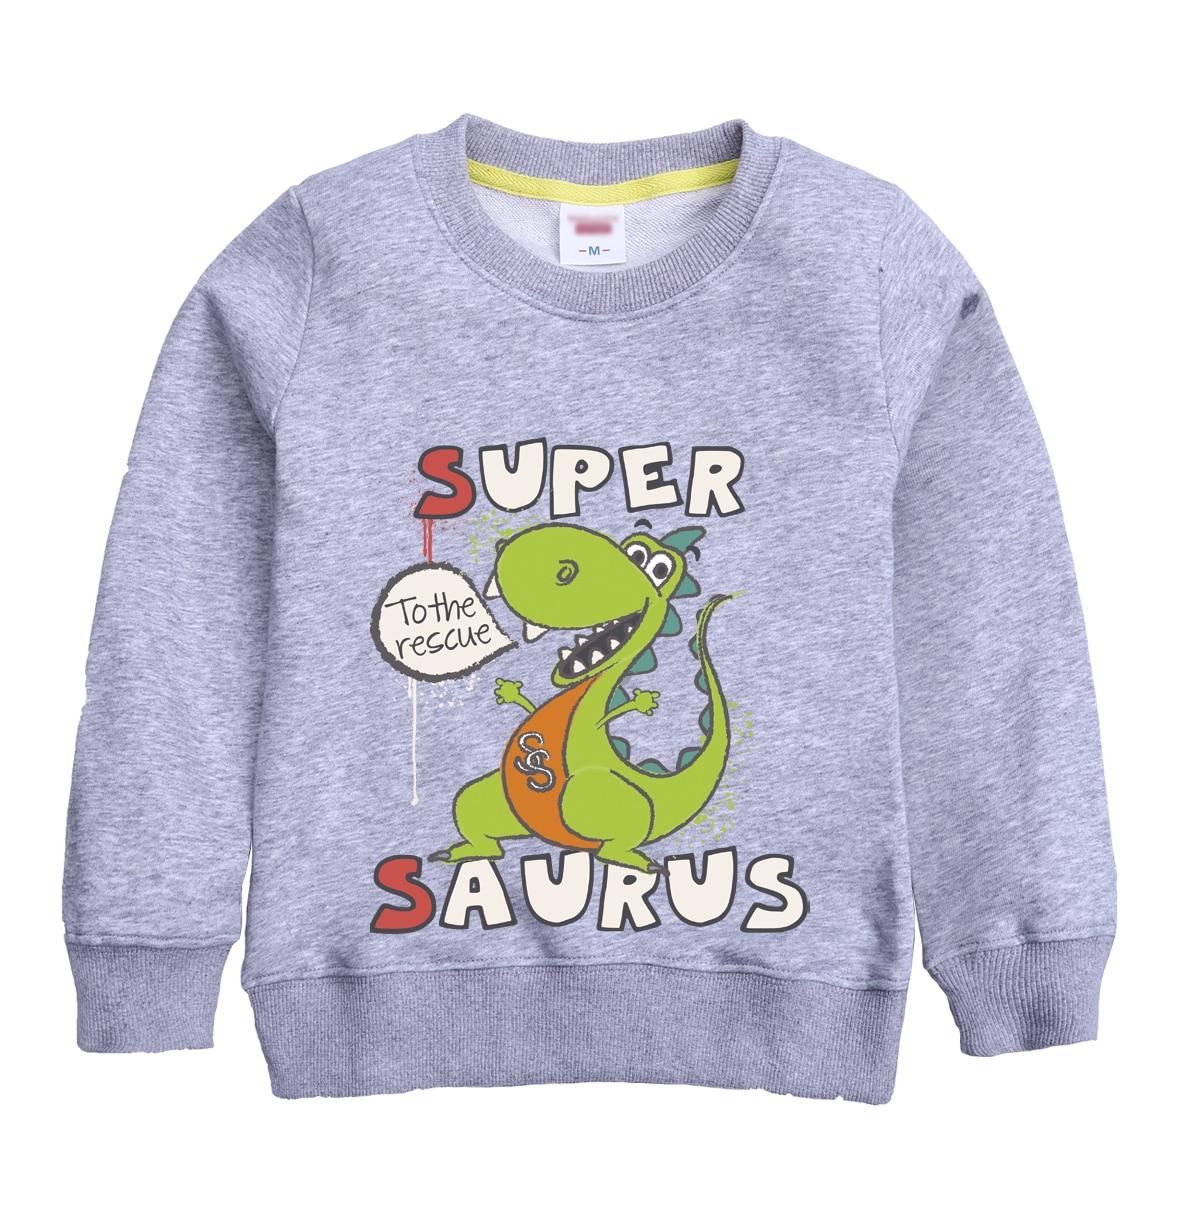 SUPER SAURUS pattern printed new fashion winter autumn sweatshirt design for boy winter sweater keeping warm of casual clothing